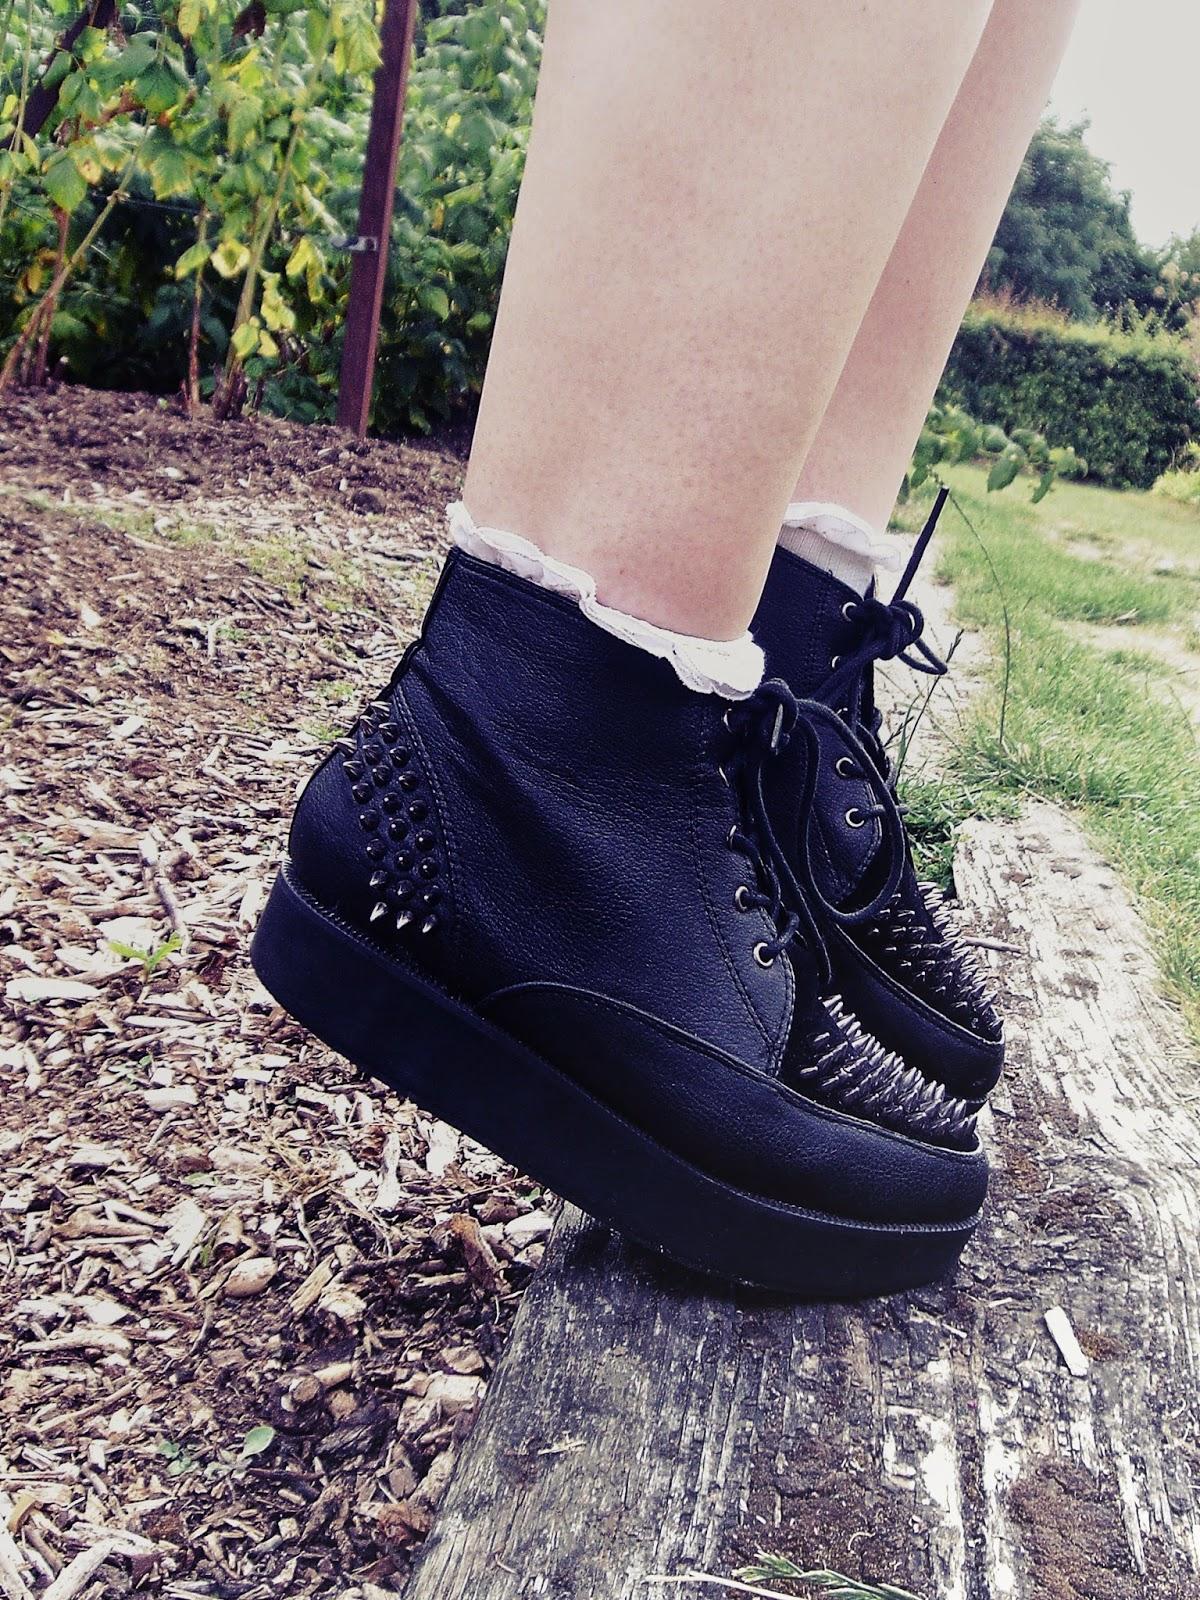 grunge, 90's grunge, 90's style, 90's fashion, platform boots, flatform boots, platform shoes, flatform shoes, lilac hair, choker, frilly socks, alternative girl, indie, hipster, fedora